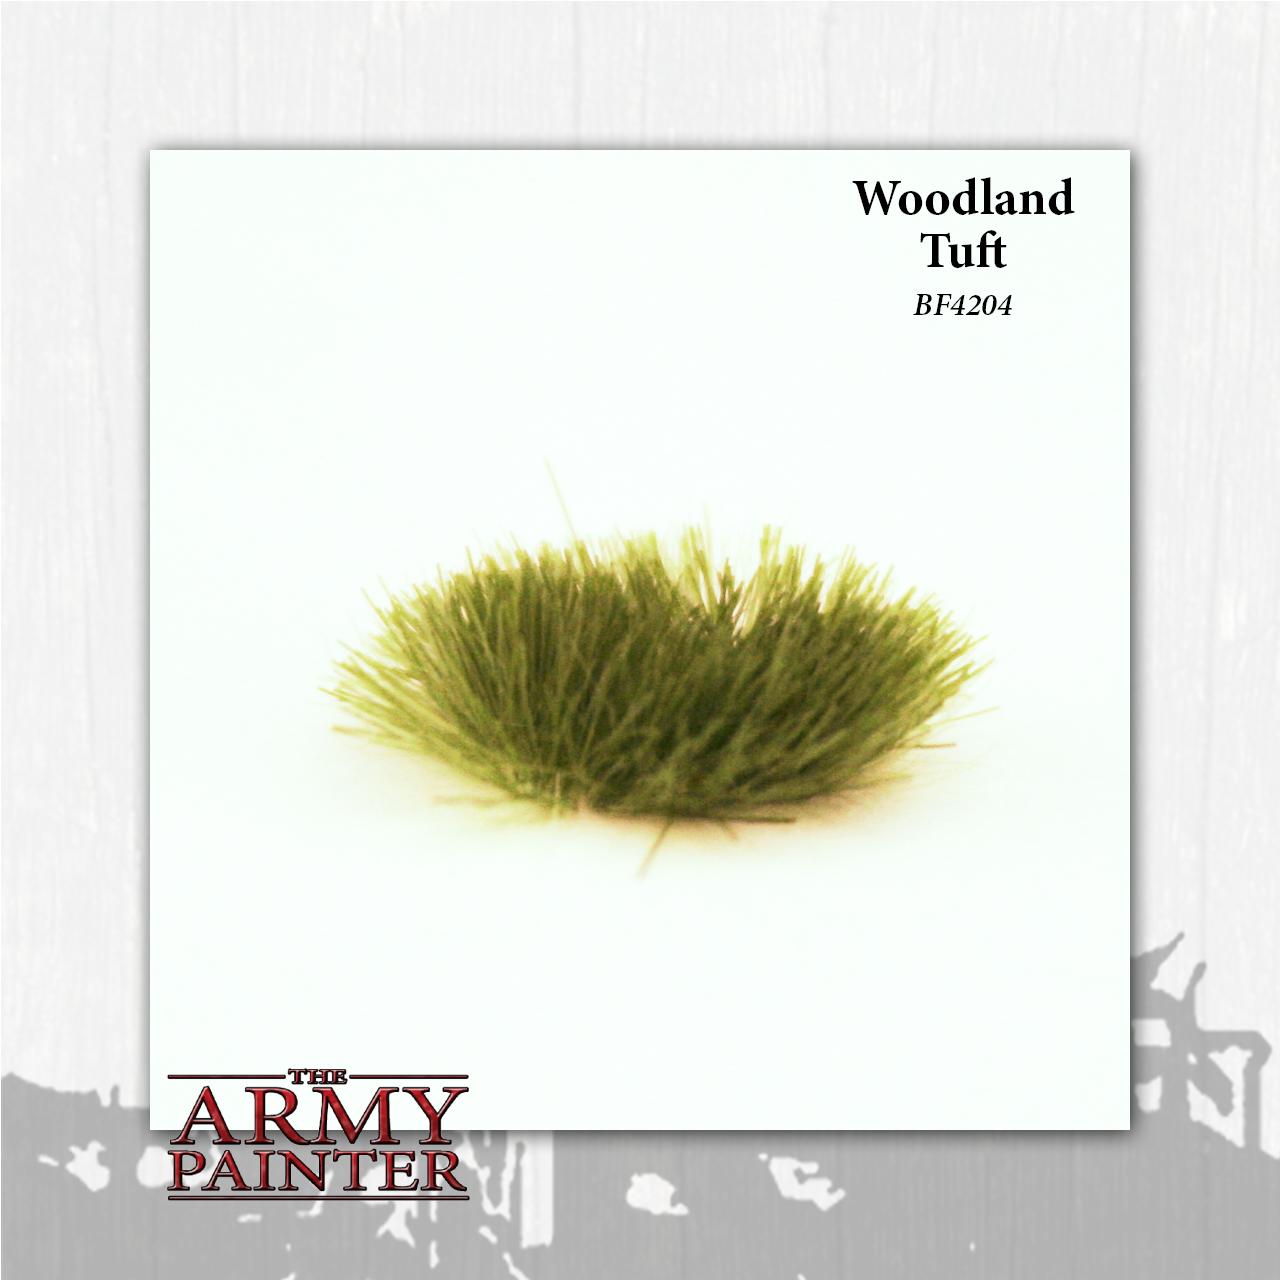 Battlefields XP: Woodland Tuft - Army Painter